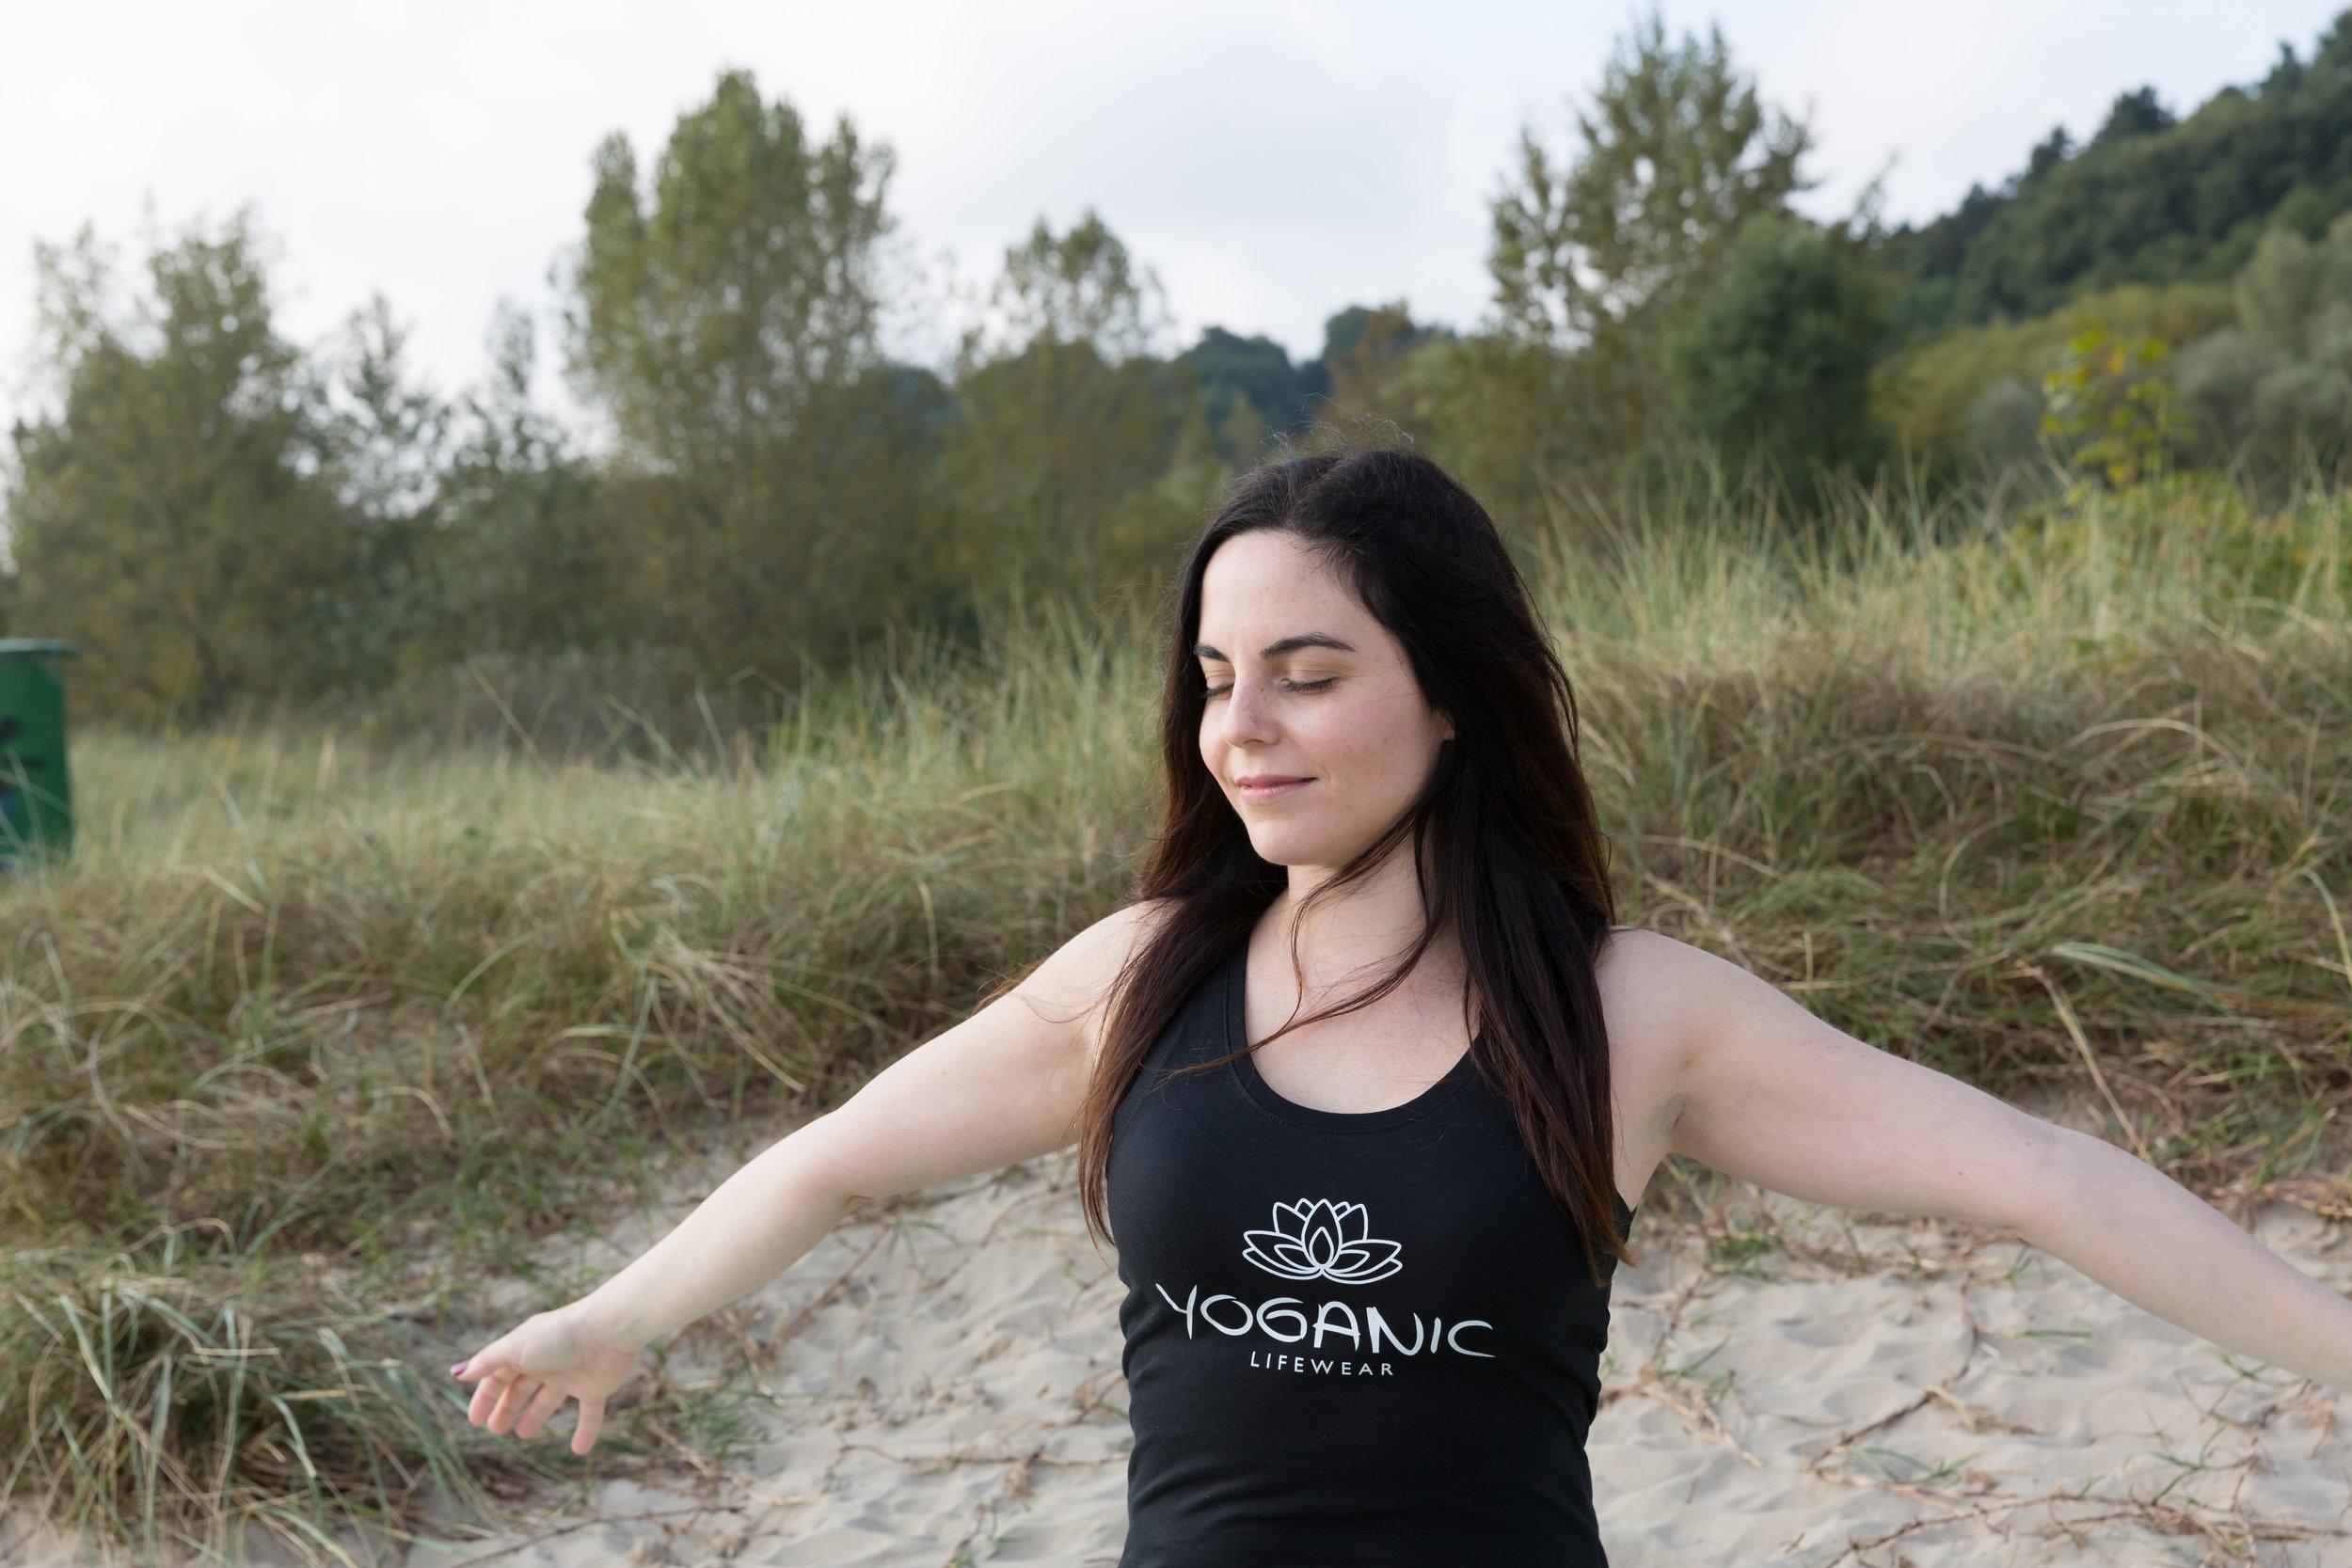 51_Morgenroutine Caros Karma Spiritual Blogger Hamburg.JPG